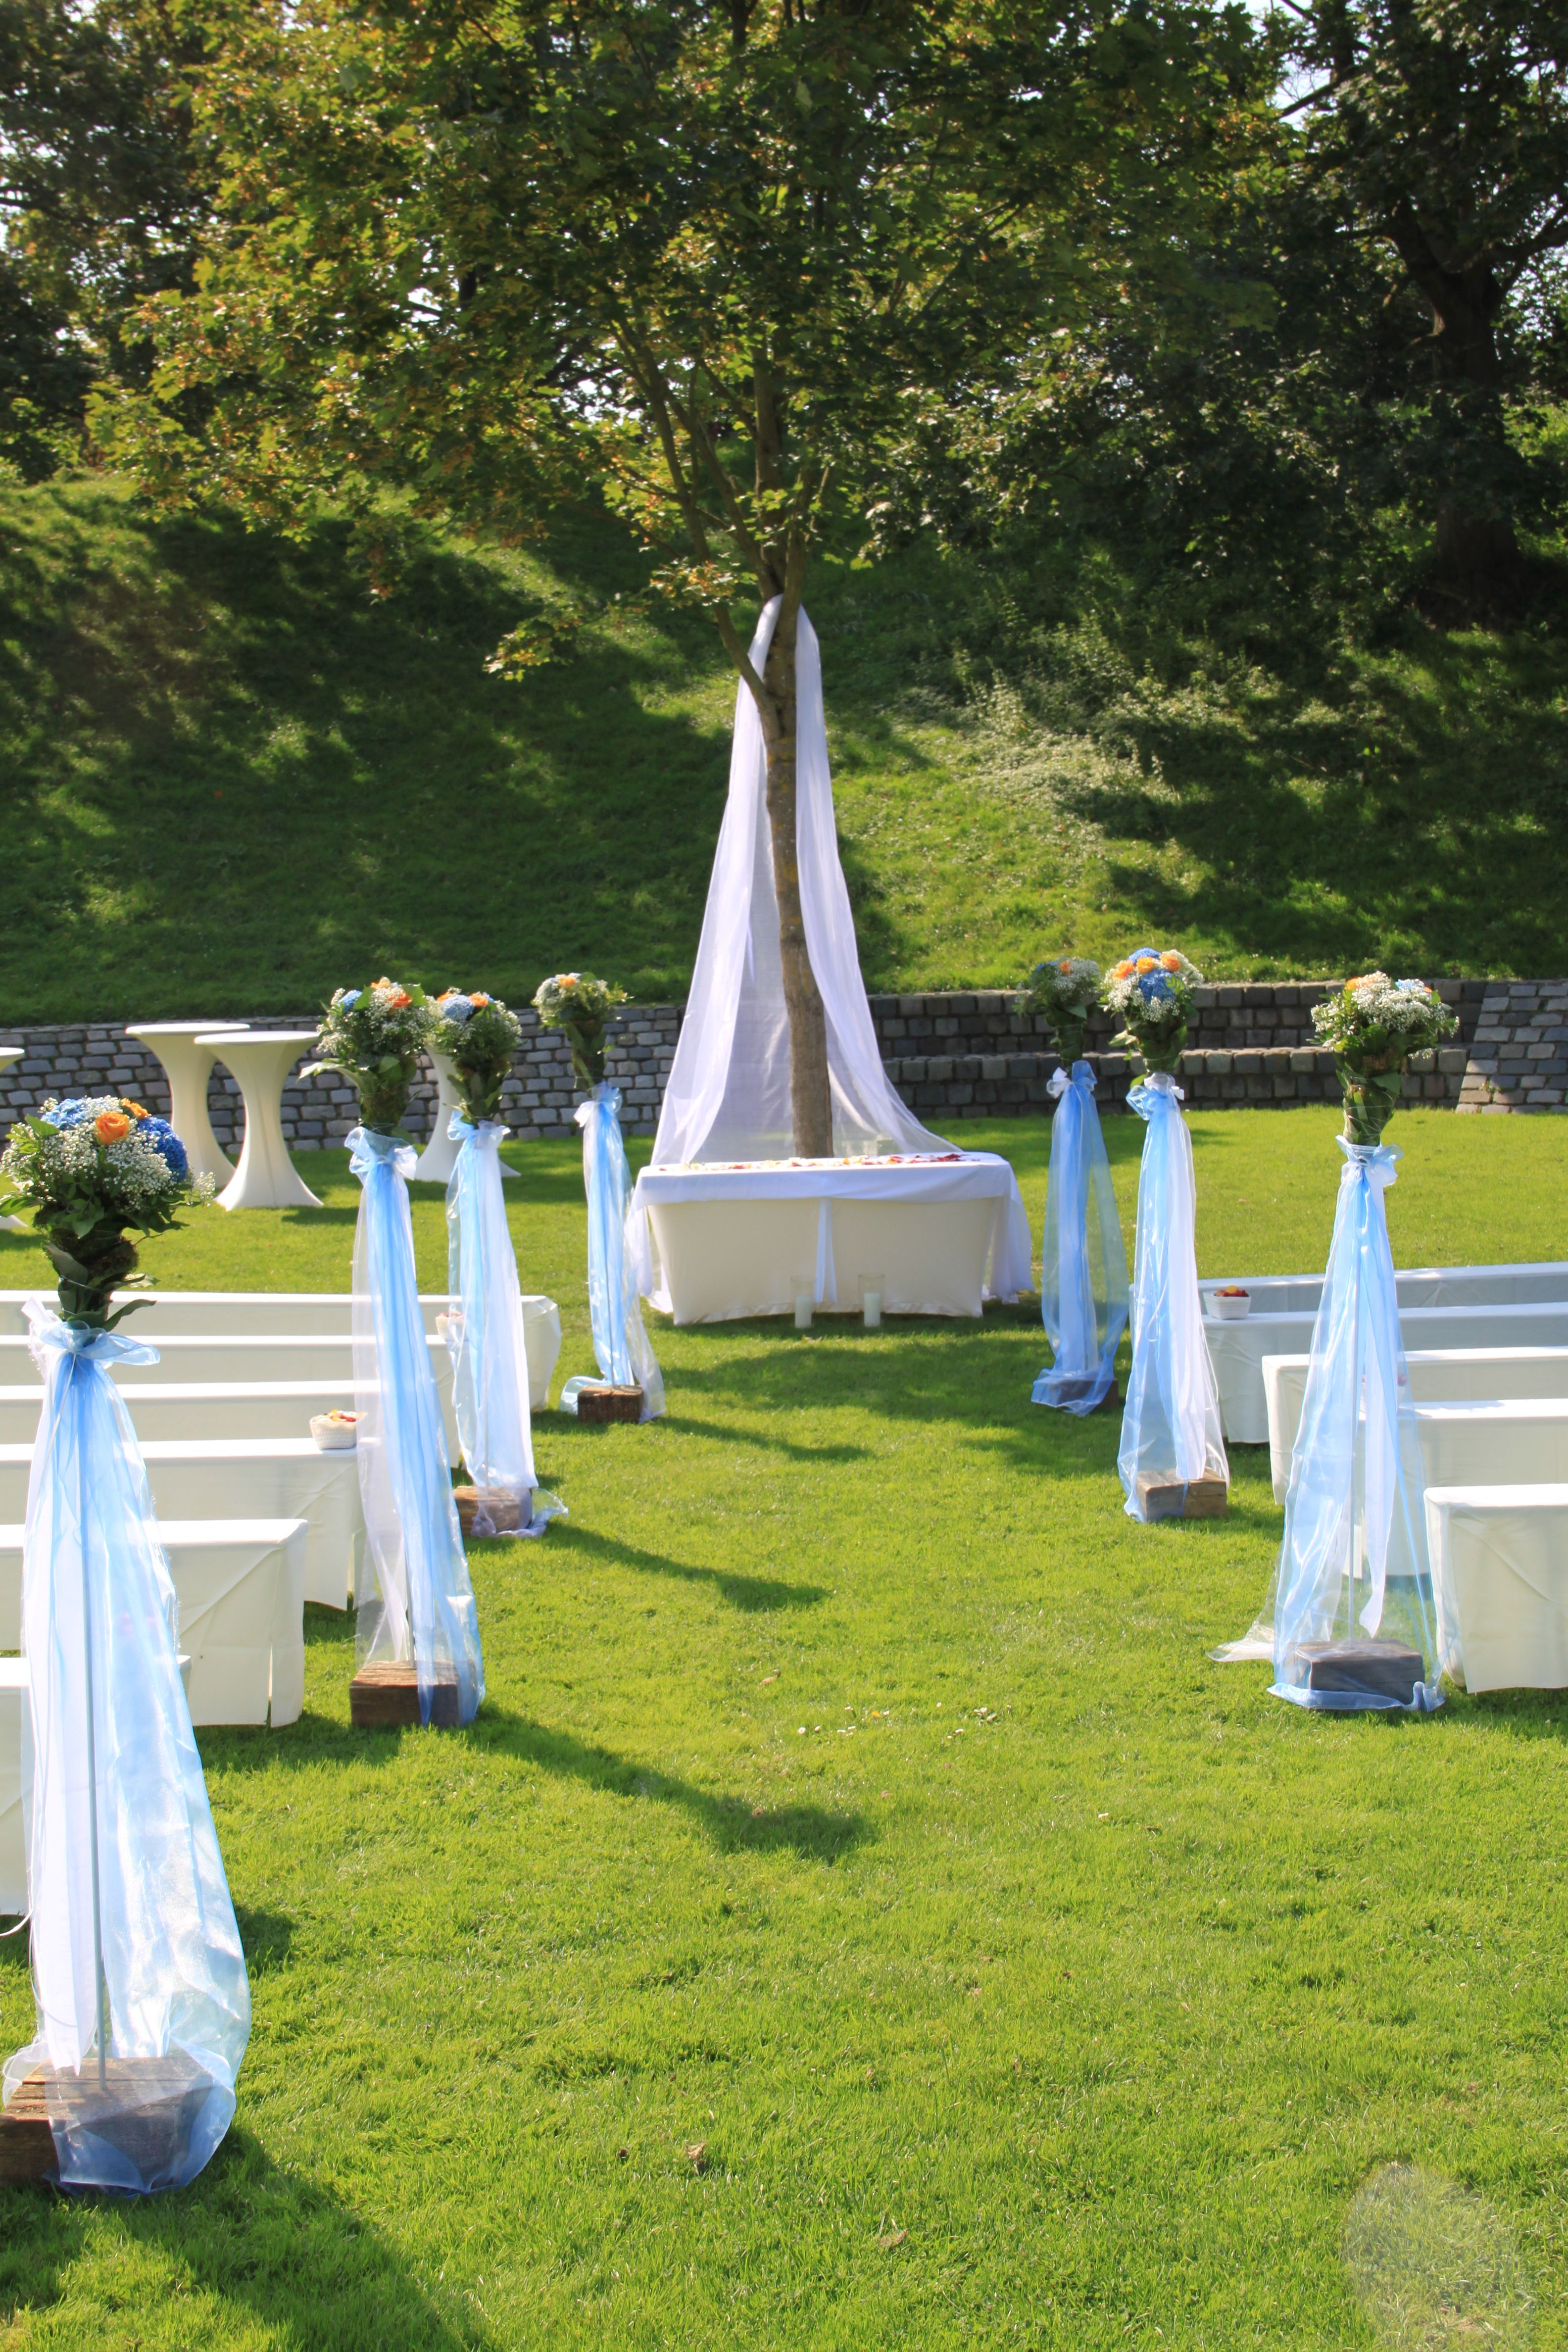 Our Wedding Location At Luisenpark Mannheim Germany Wedding